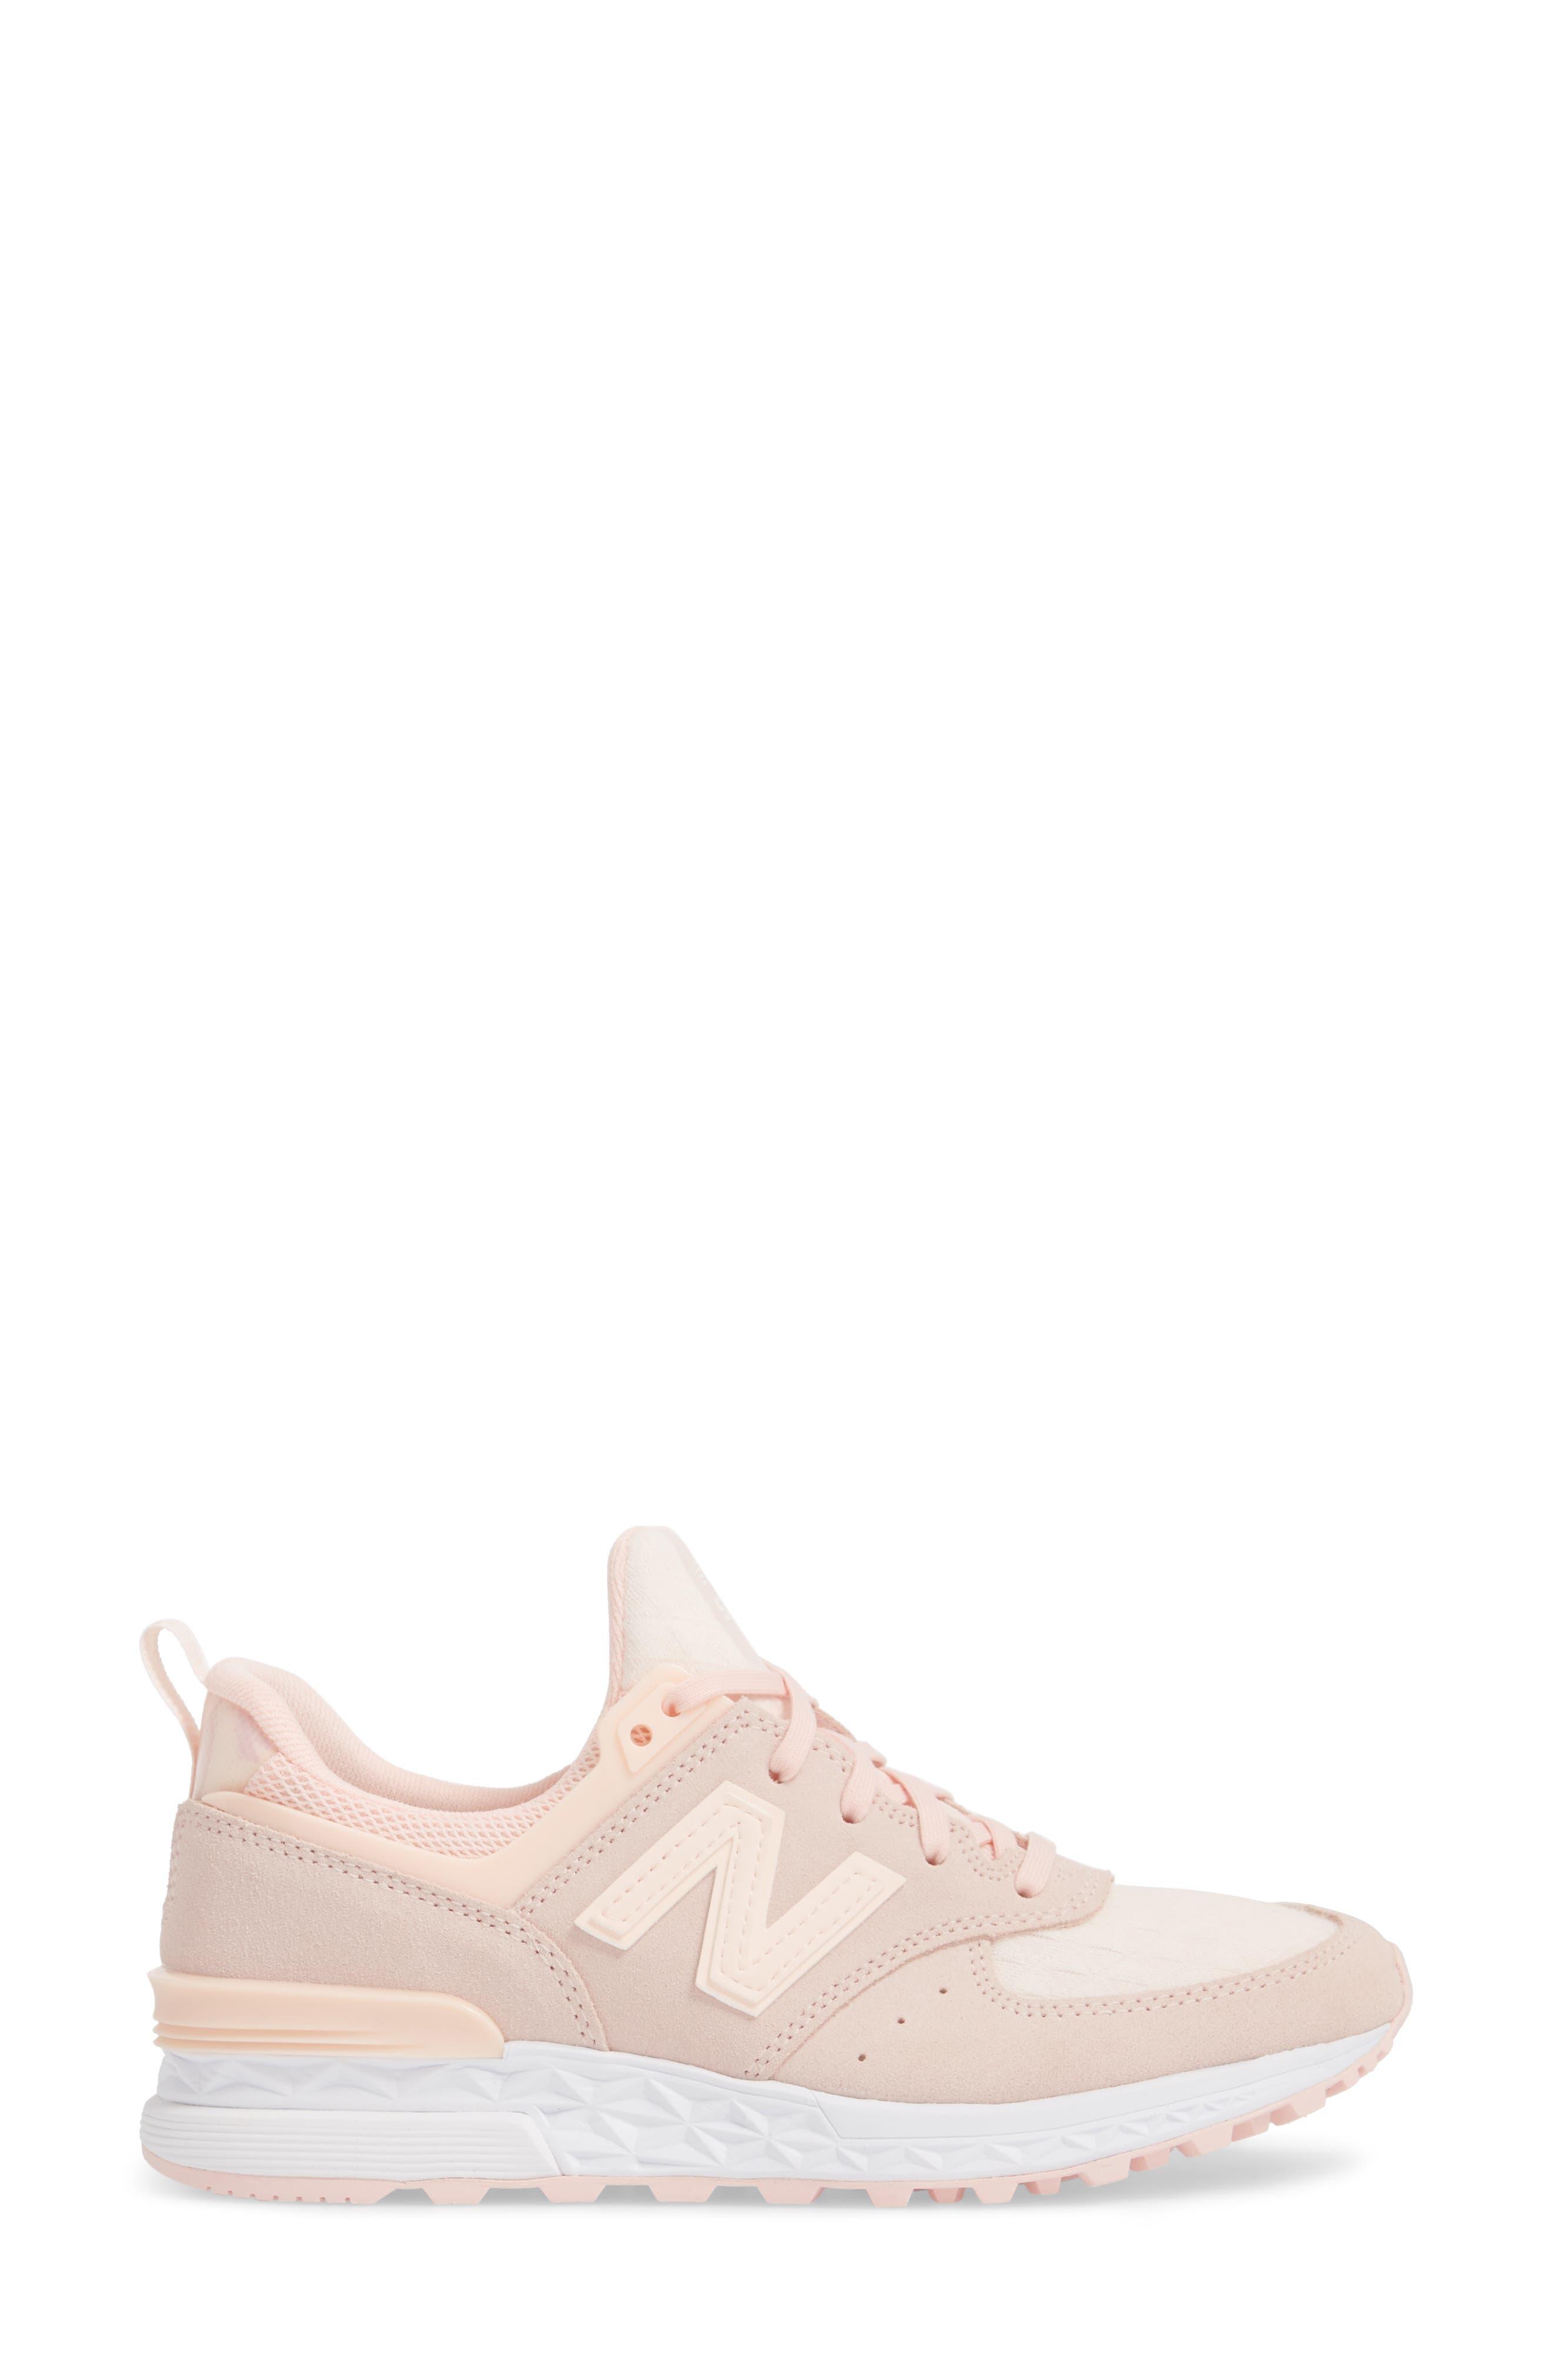 '574' Sneaker,                             Alternate thumbnail 3, color,                             Sunrise Glow